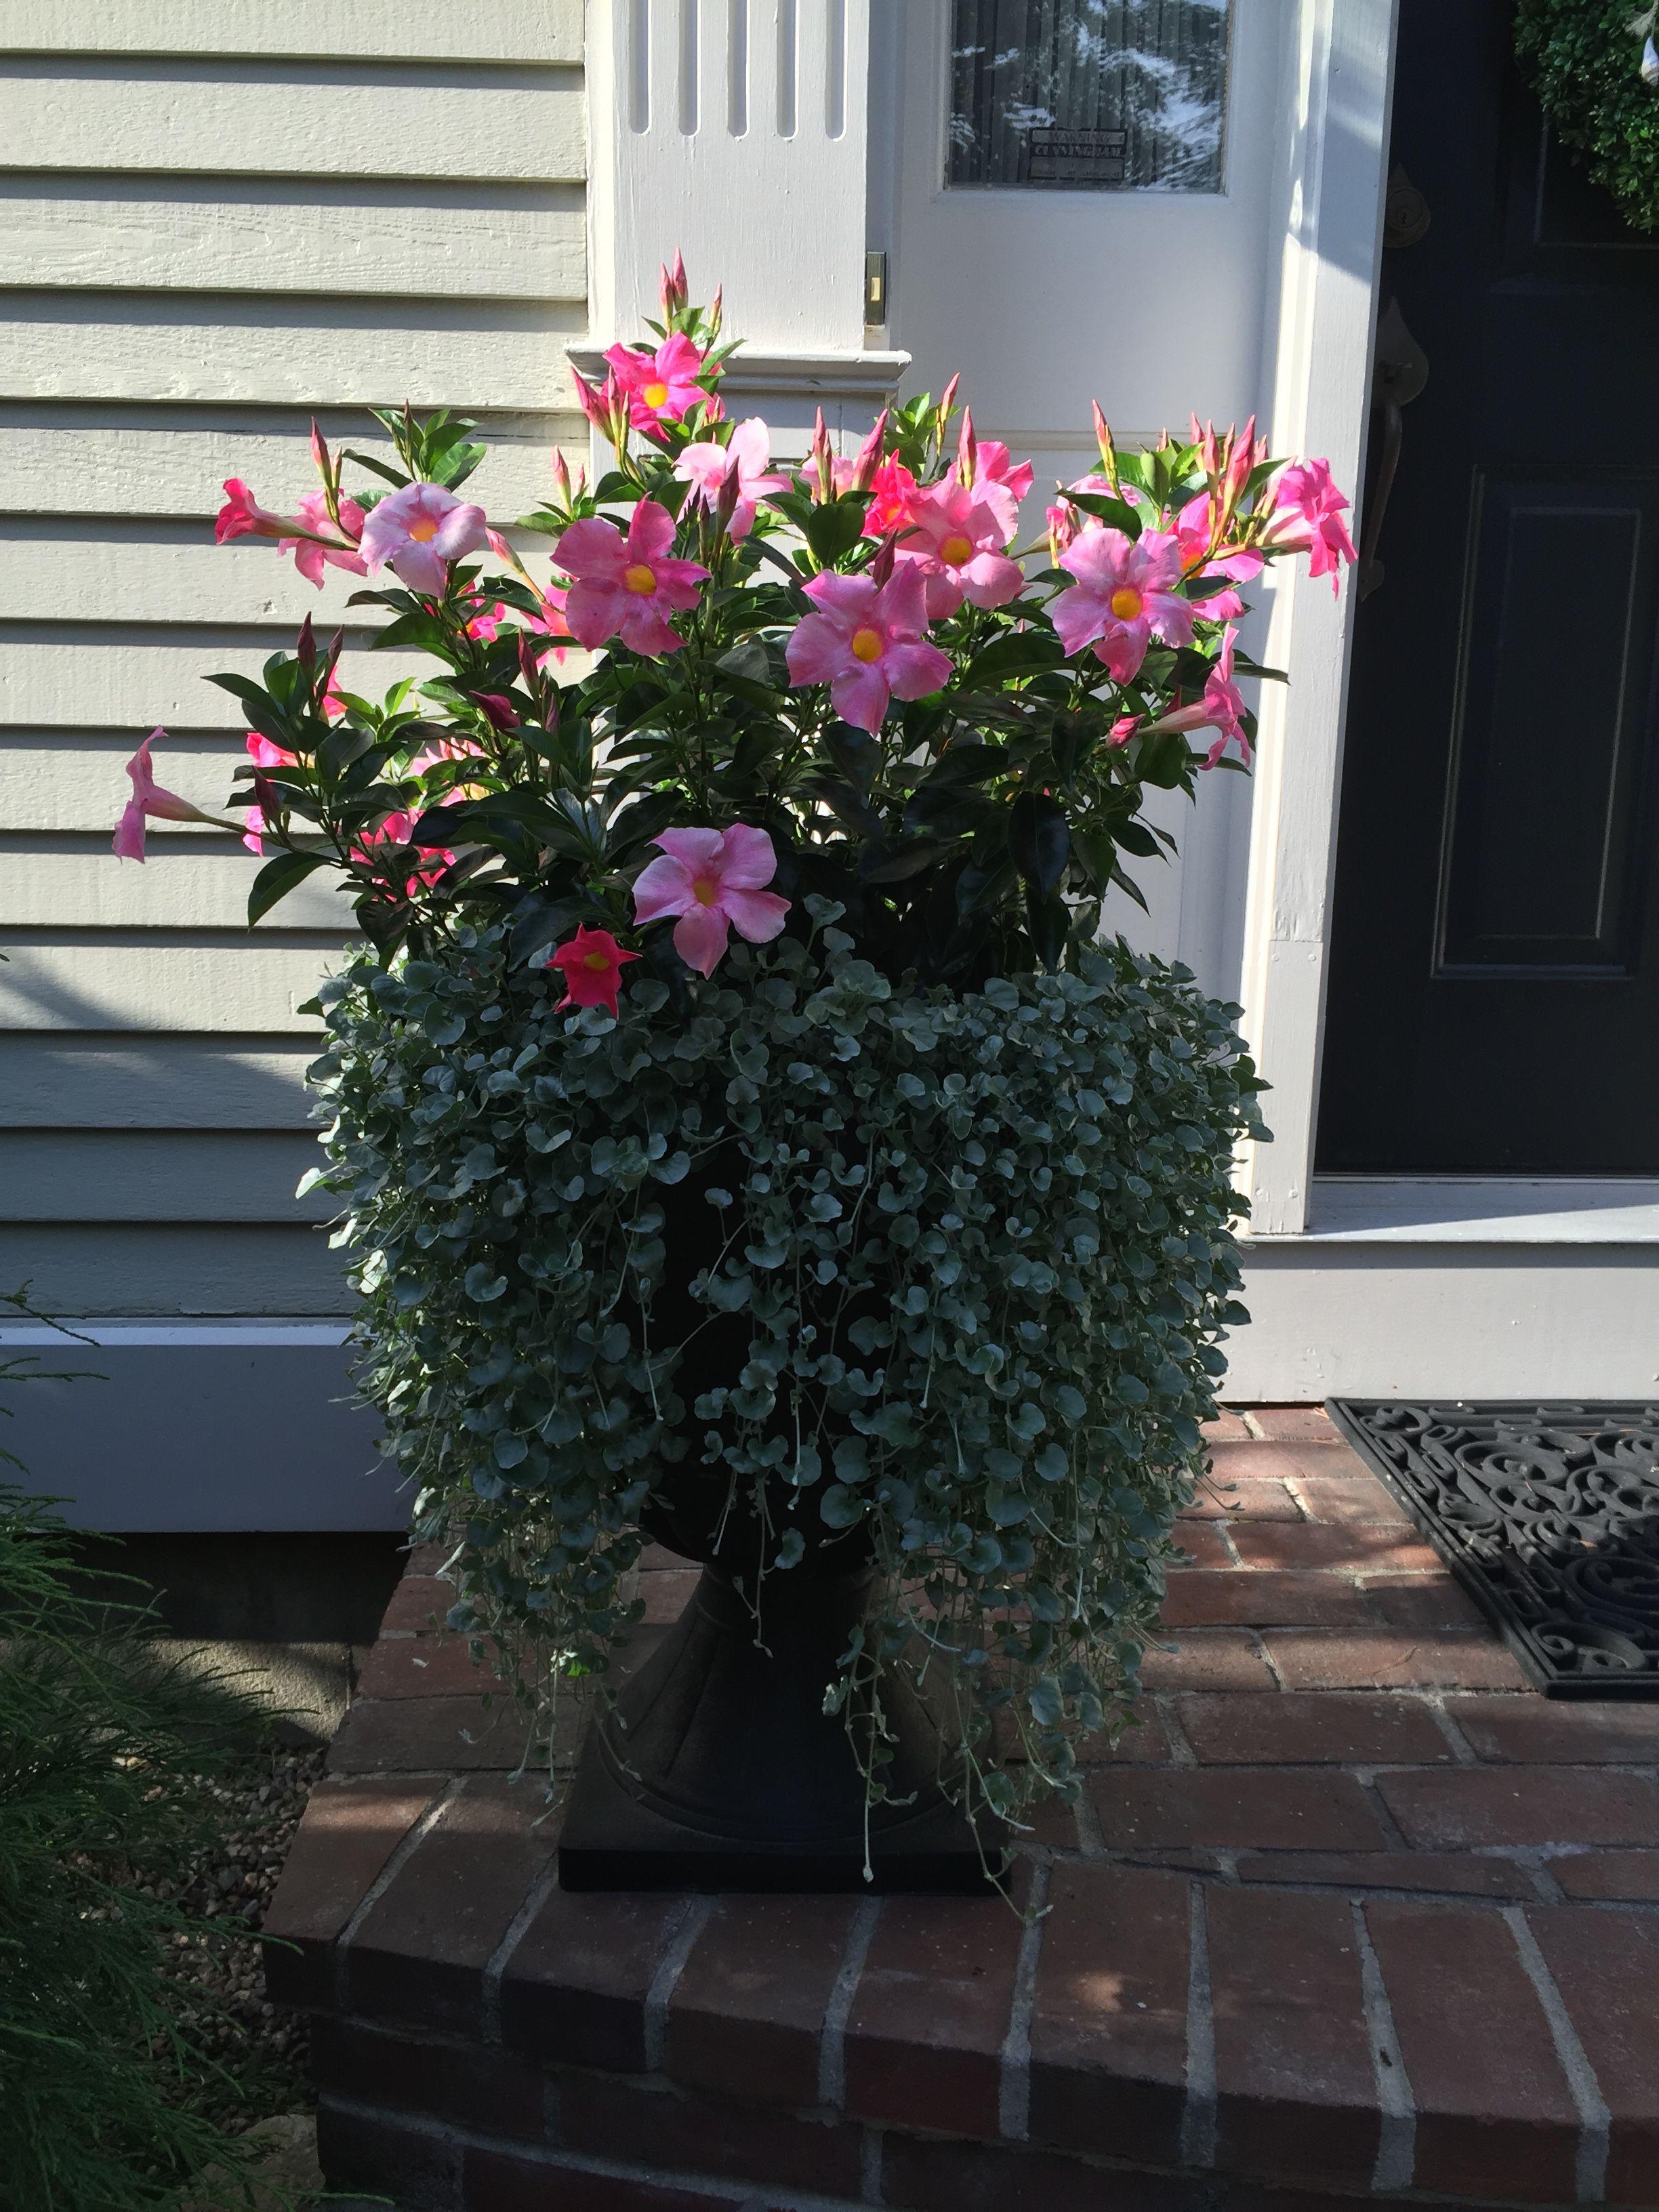 Garden Plant Large Showy Flowers Crossword Clue | Best ...